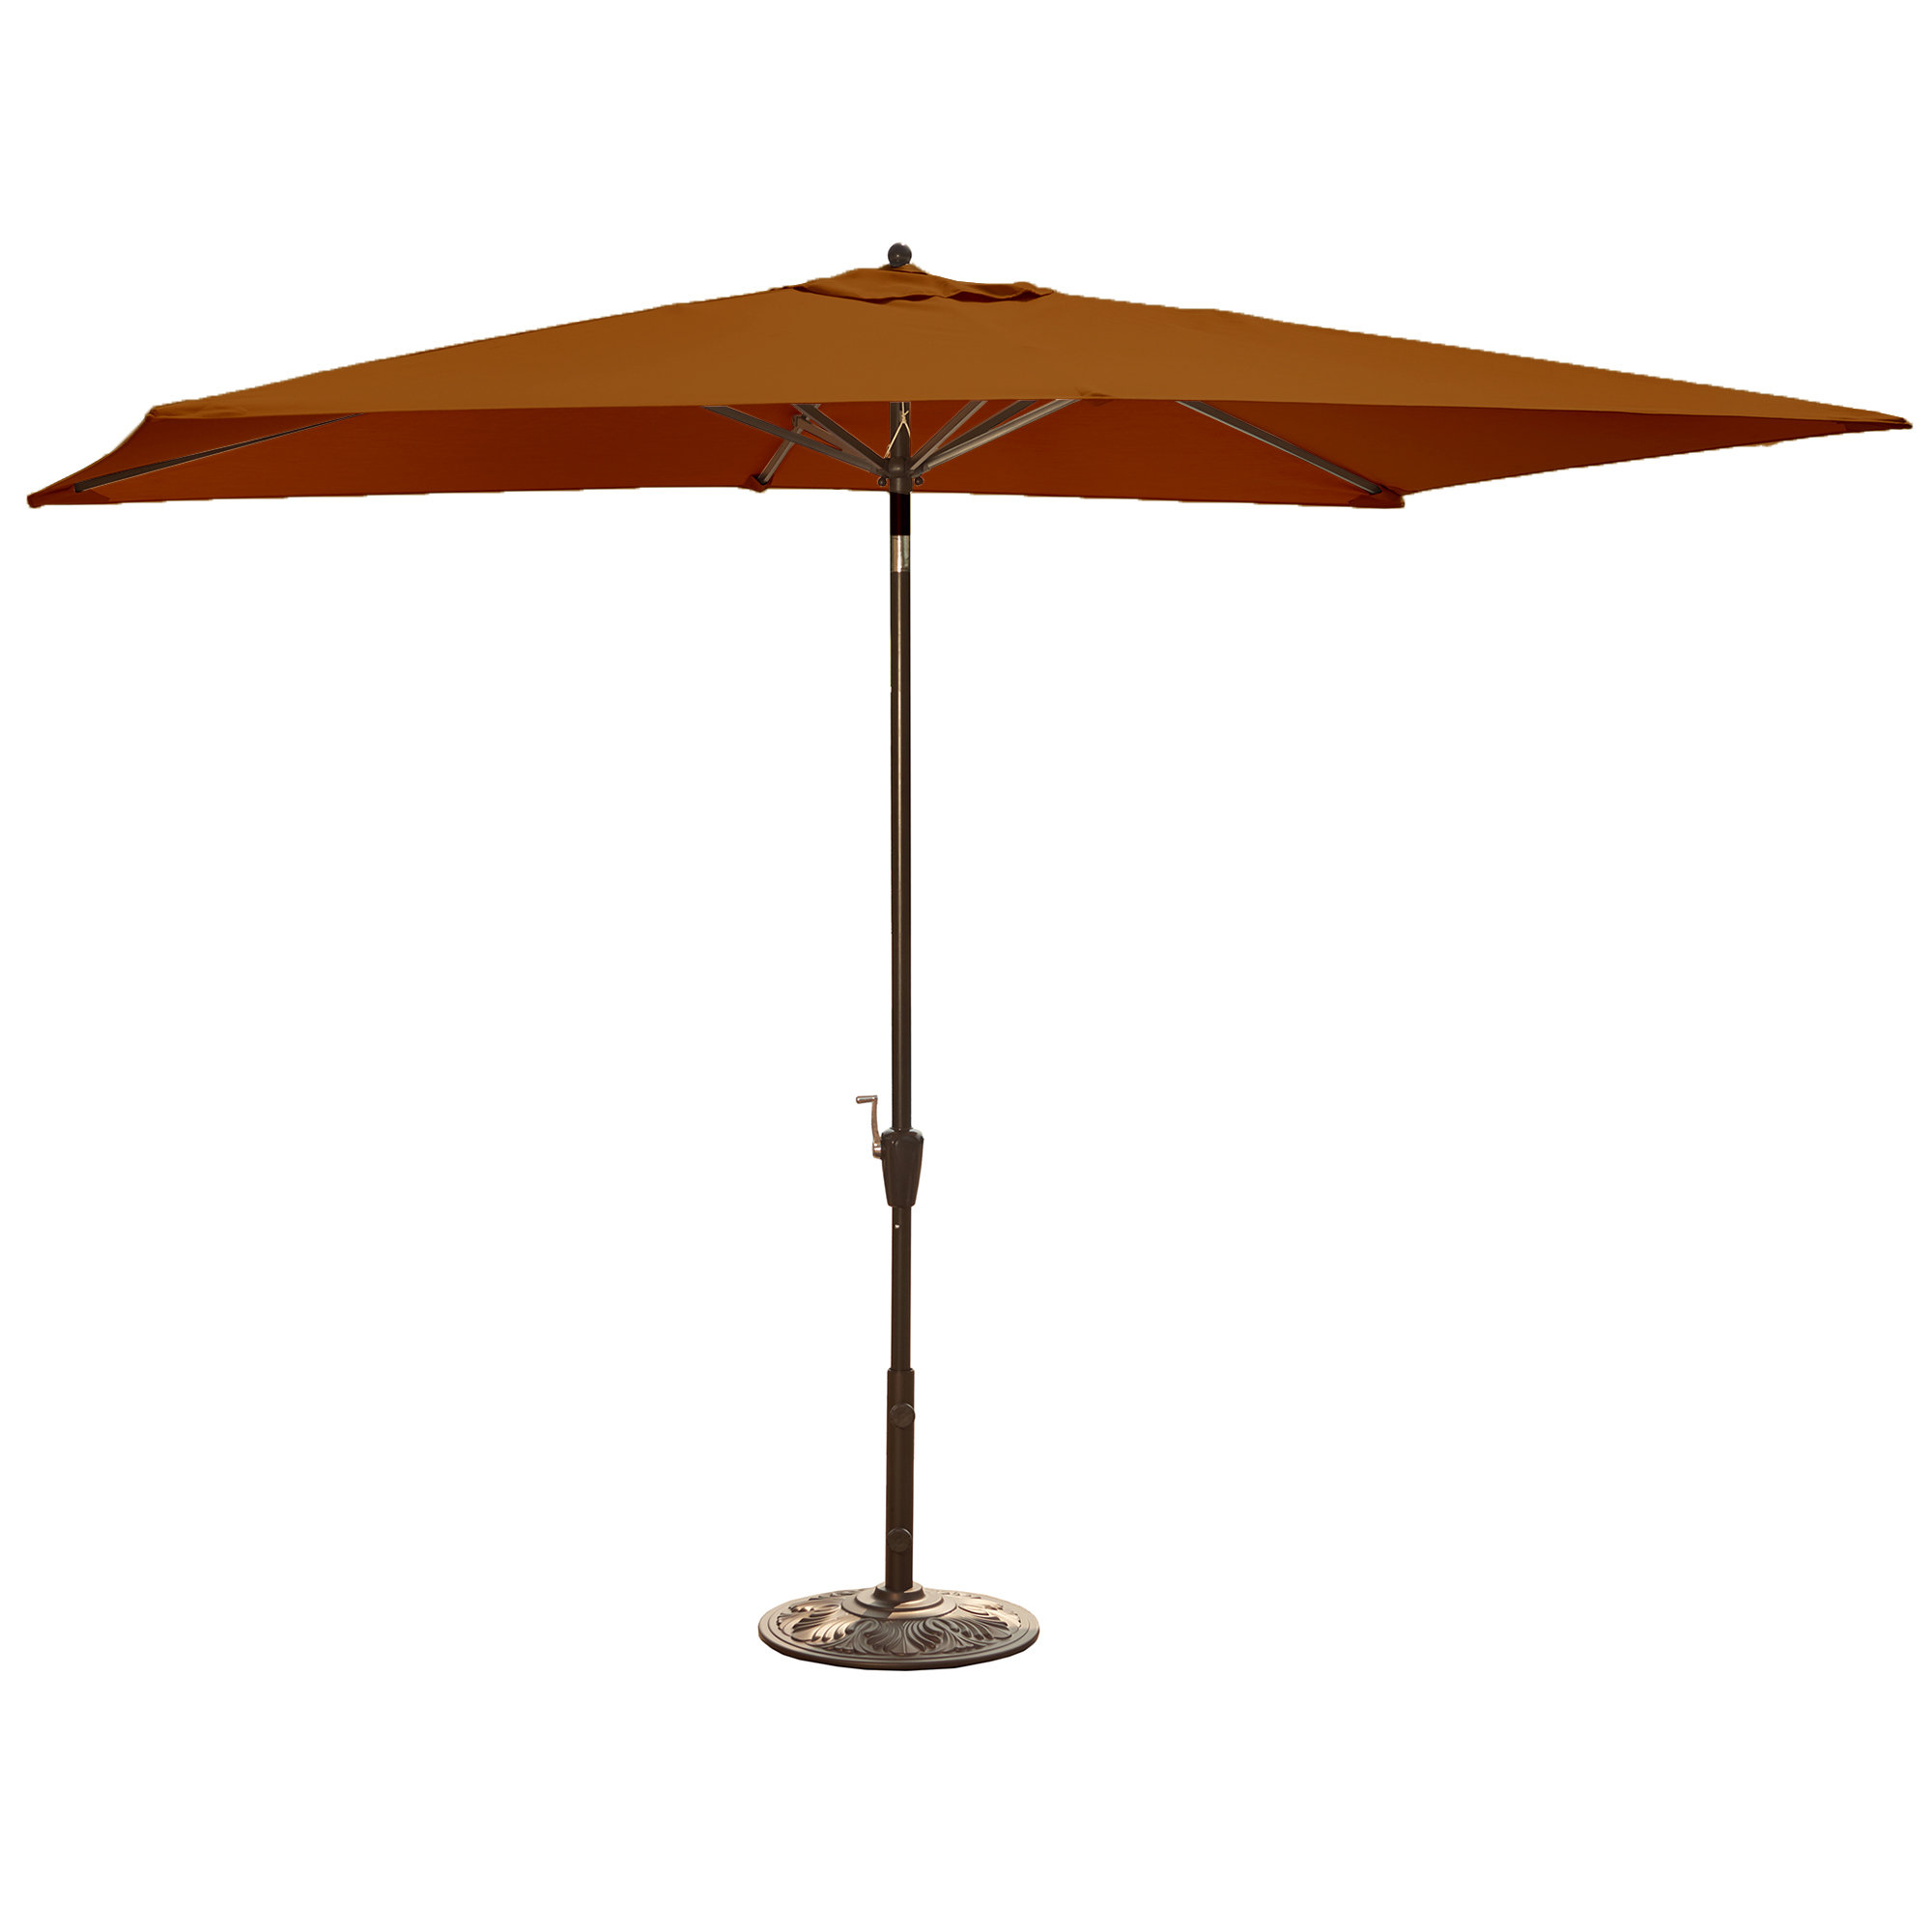 Wieczorek Auto Tilt Rectangular Market Sunbrella Umbrellas Pertaining To Well Known Adriatic 10' X (View 6 of 20)